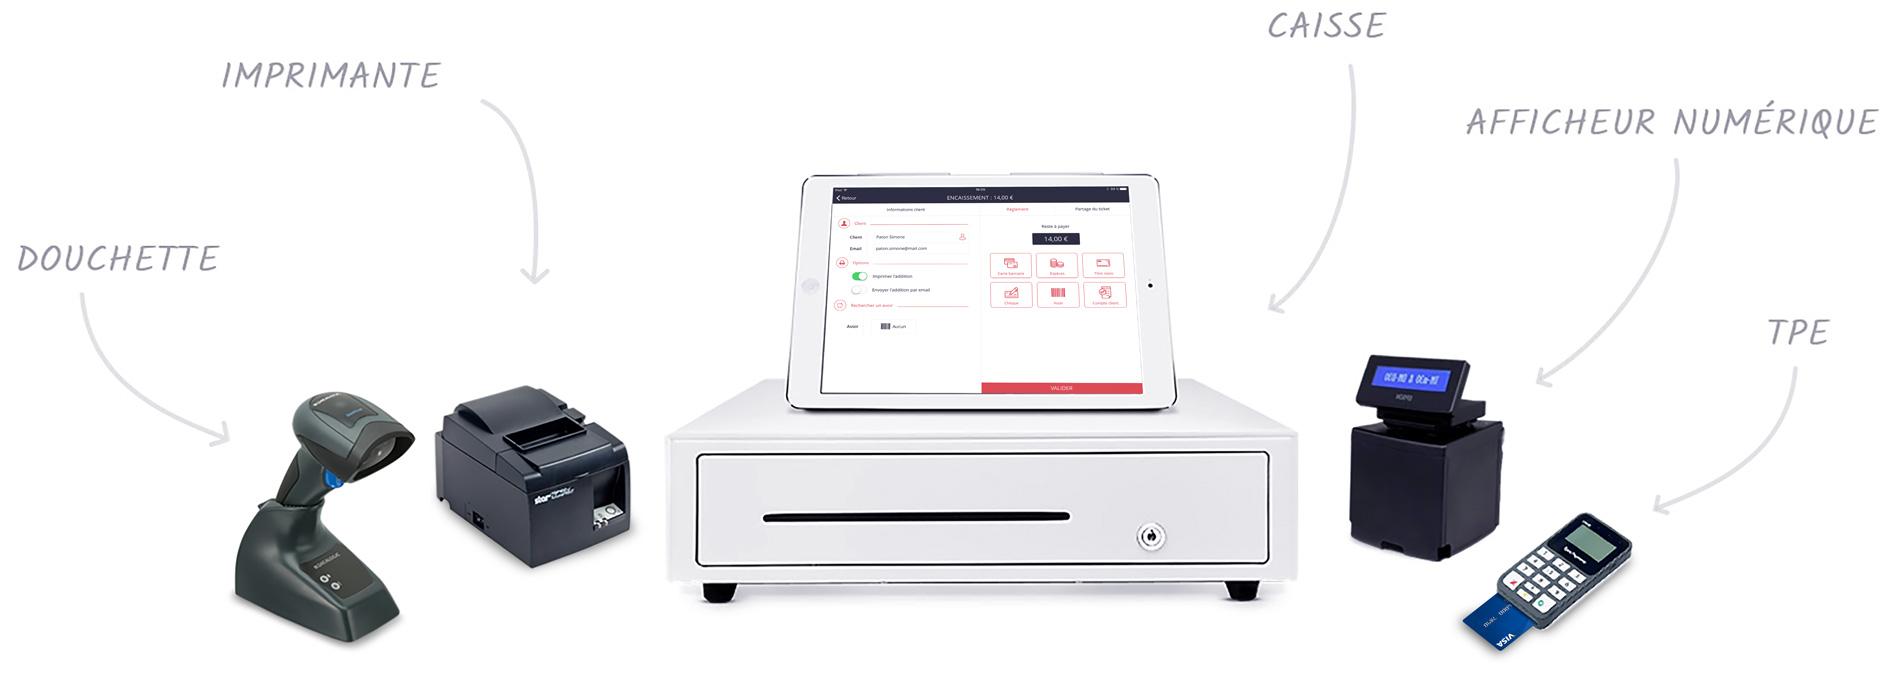 Equipment pack : scanner, printer, cash drawer, display, EPT